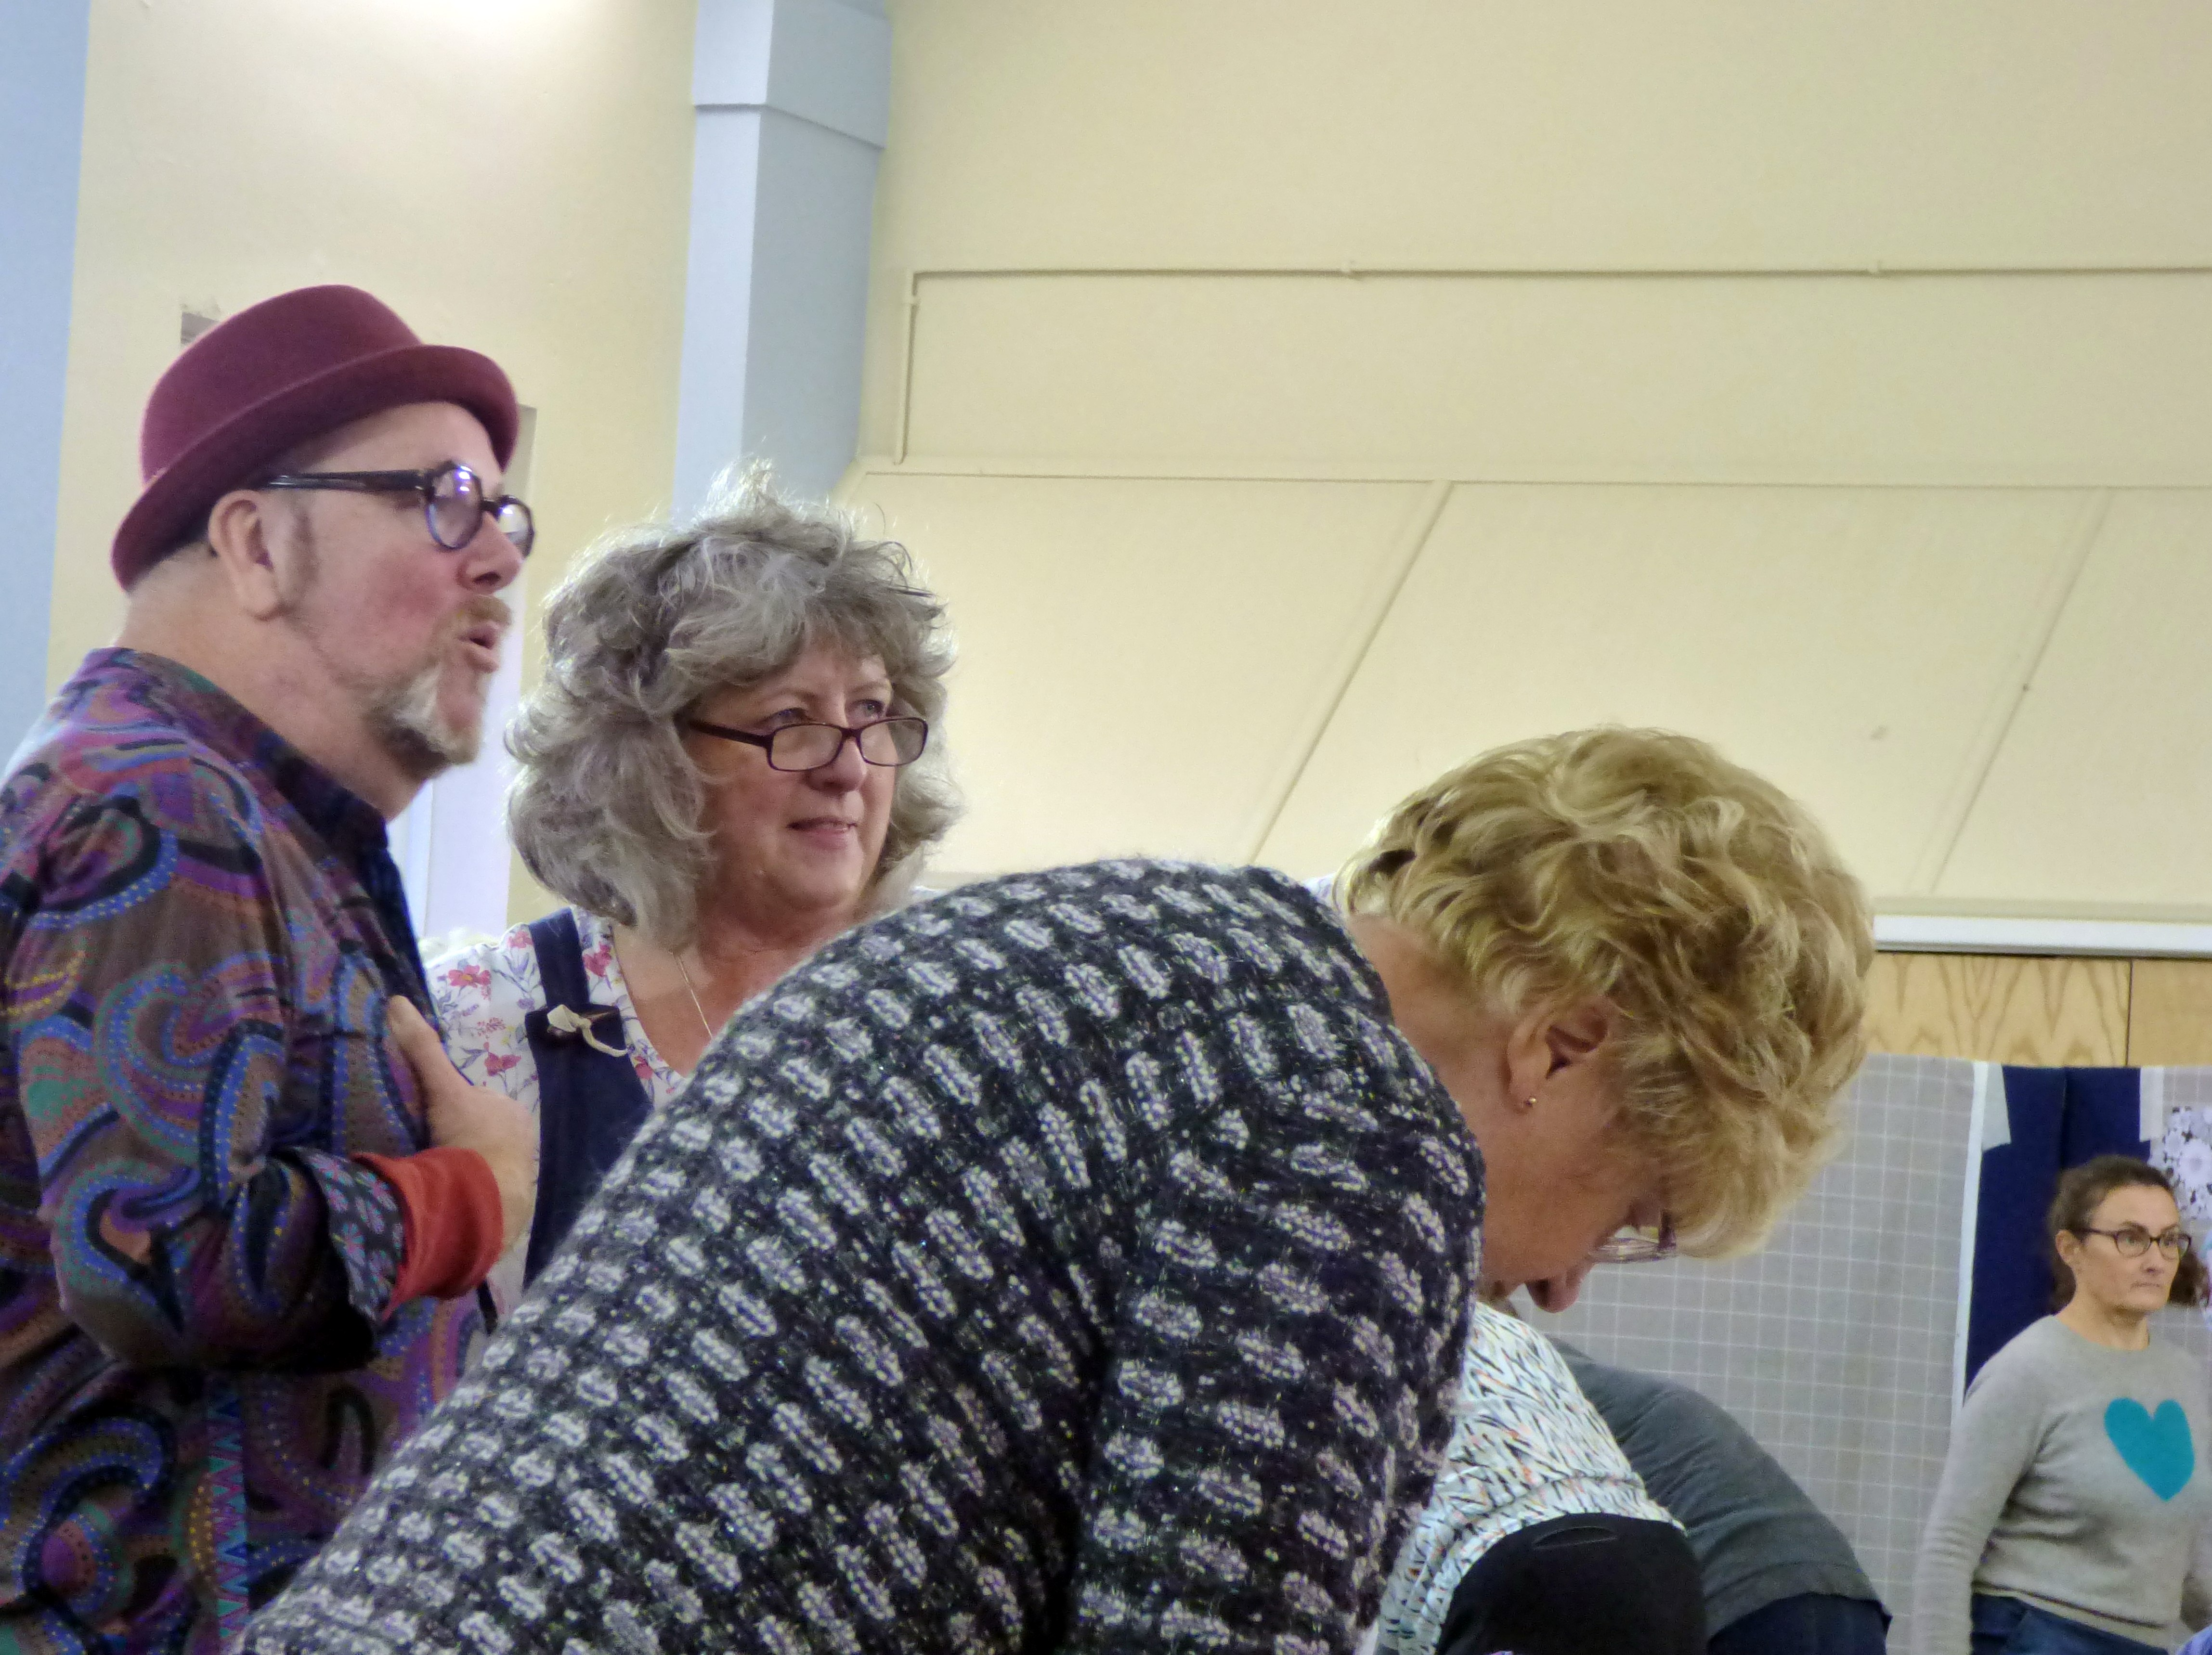 Brandon and Carol discussing design points- Kaffe Fassett workshop, All Hallows, Dec 2016